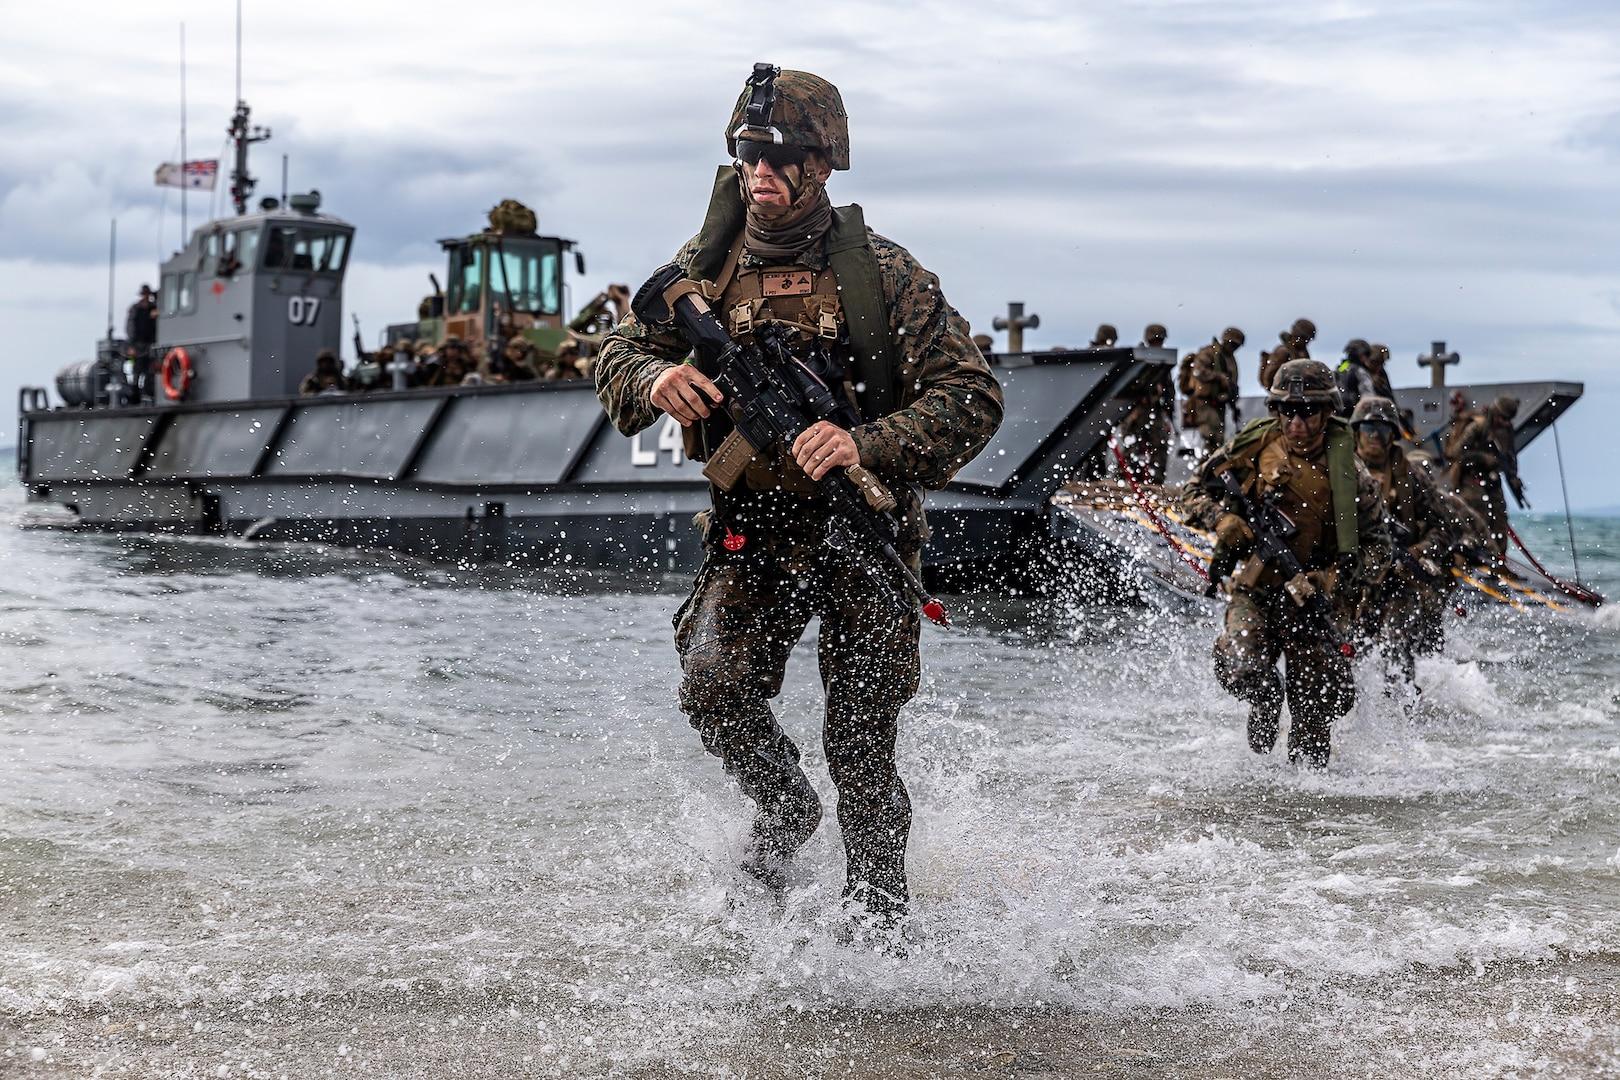 U.S. Marines Complete Simulated Combined Amphibious Assault, Reconnaissance Raid in Bowen, Australia